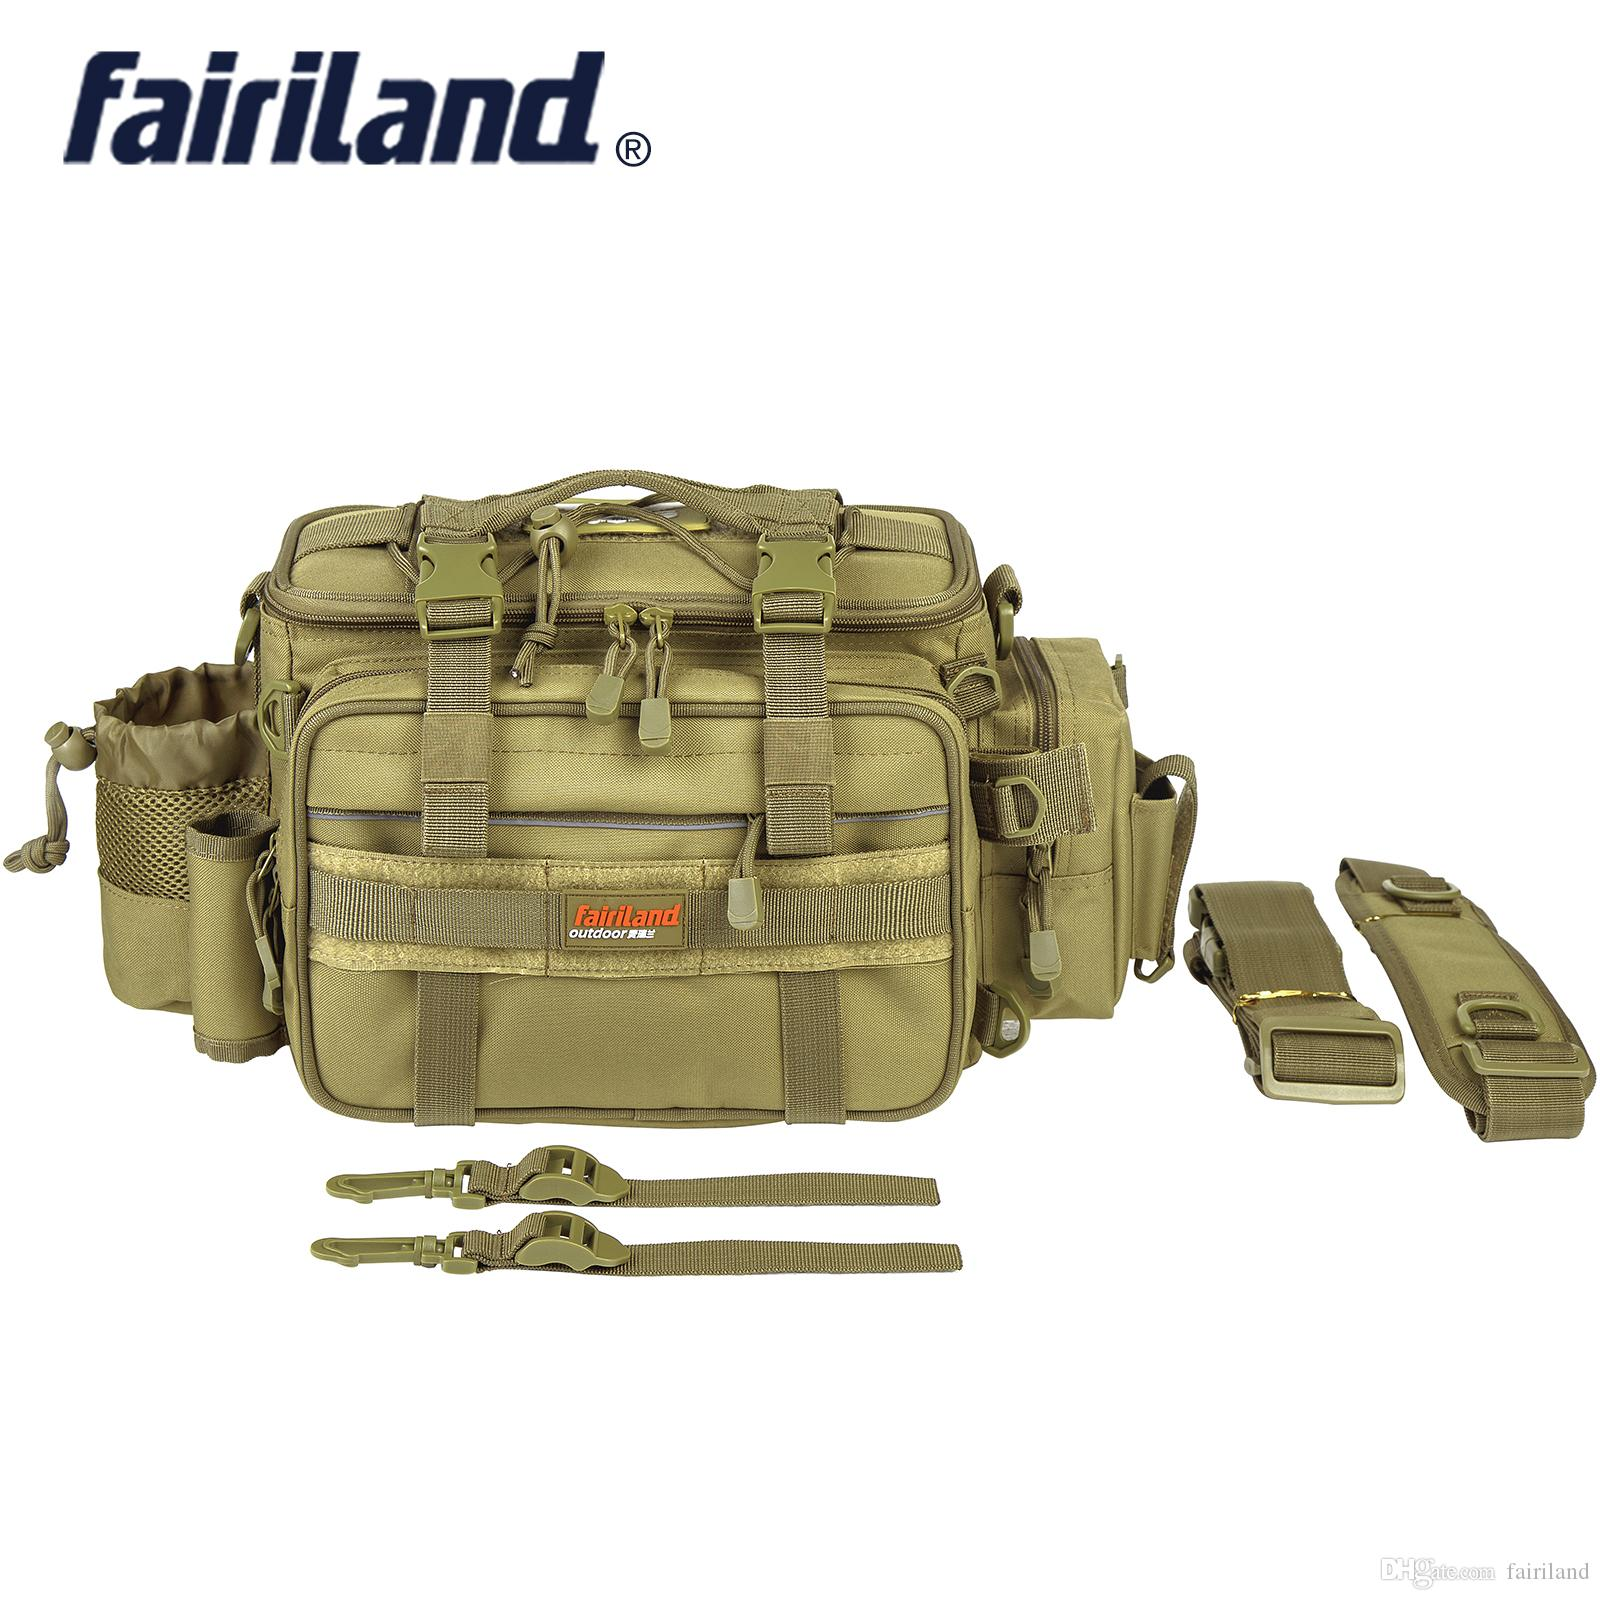 Fairiland 대형 Manly 3 색 낚시 가방 다기능 어깨 허리 낚시 기어 미끼 미끼 릴 야외 가방 태클 저장